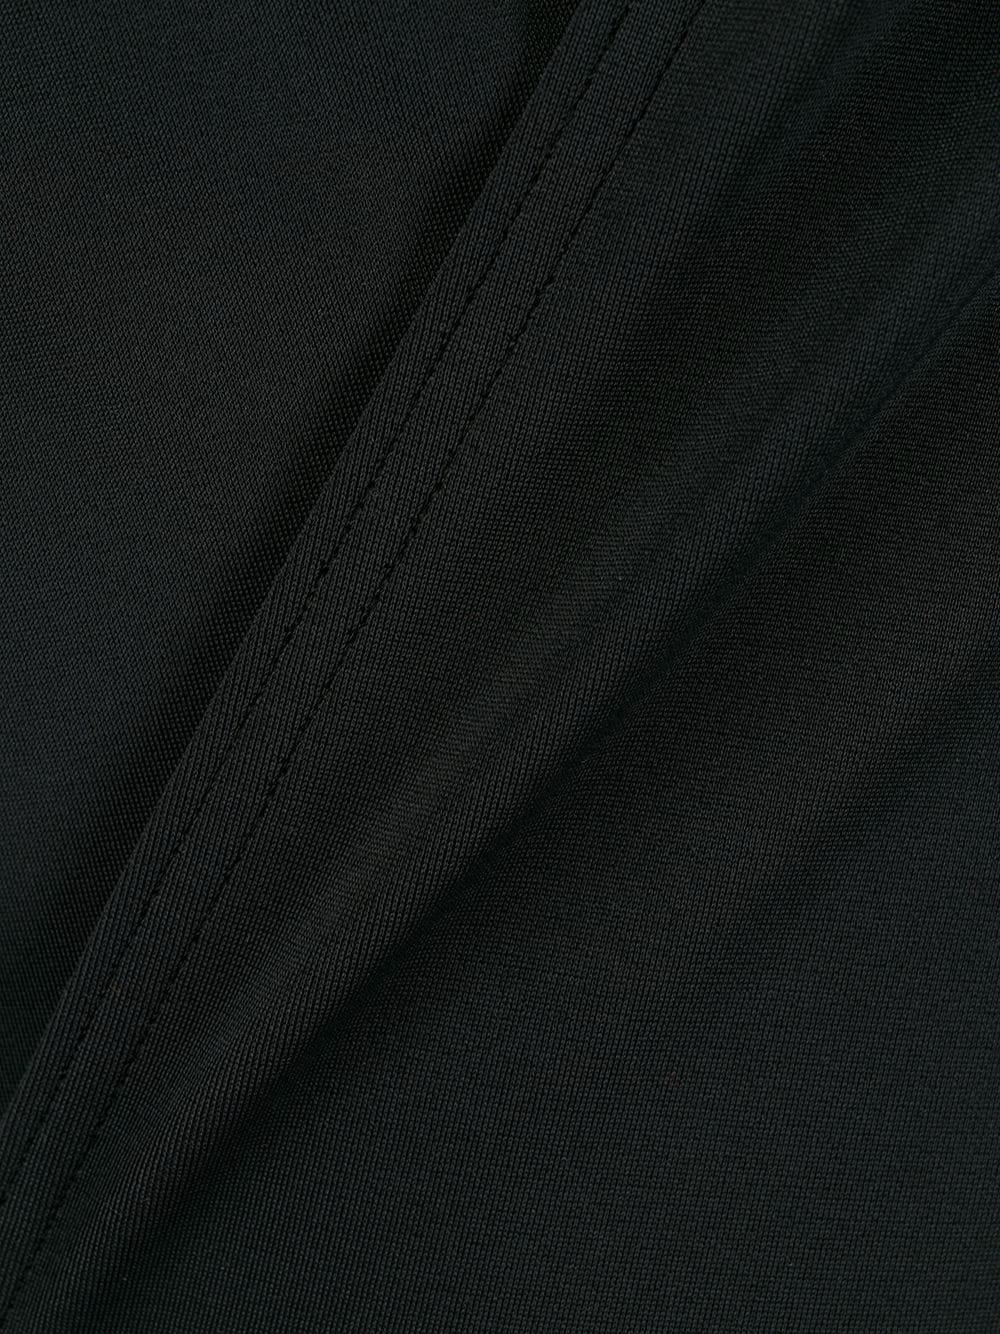 Bañador cruzado con botones decorativos Balmain de Tejido sintético de color Negro